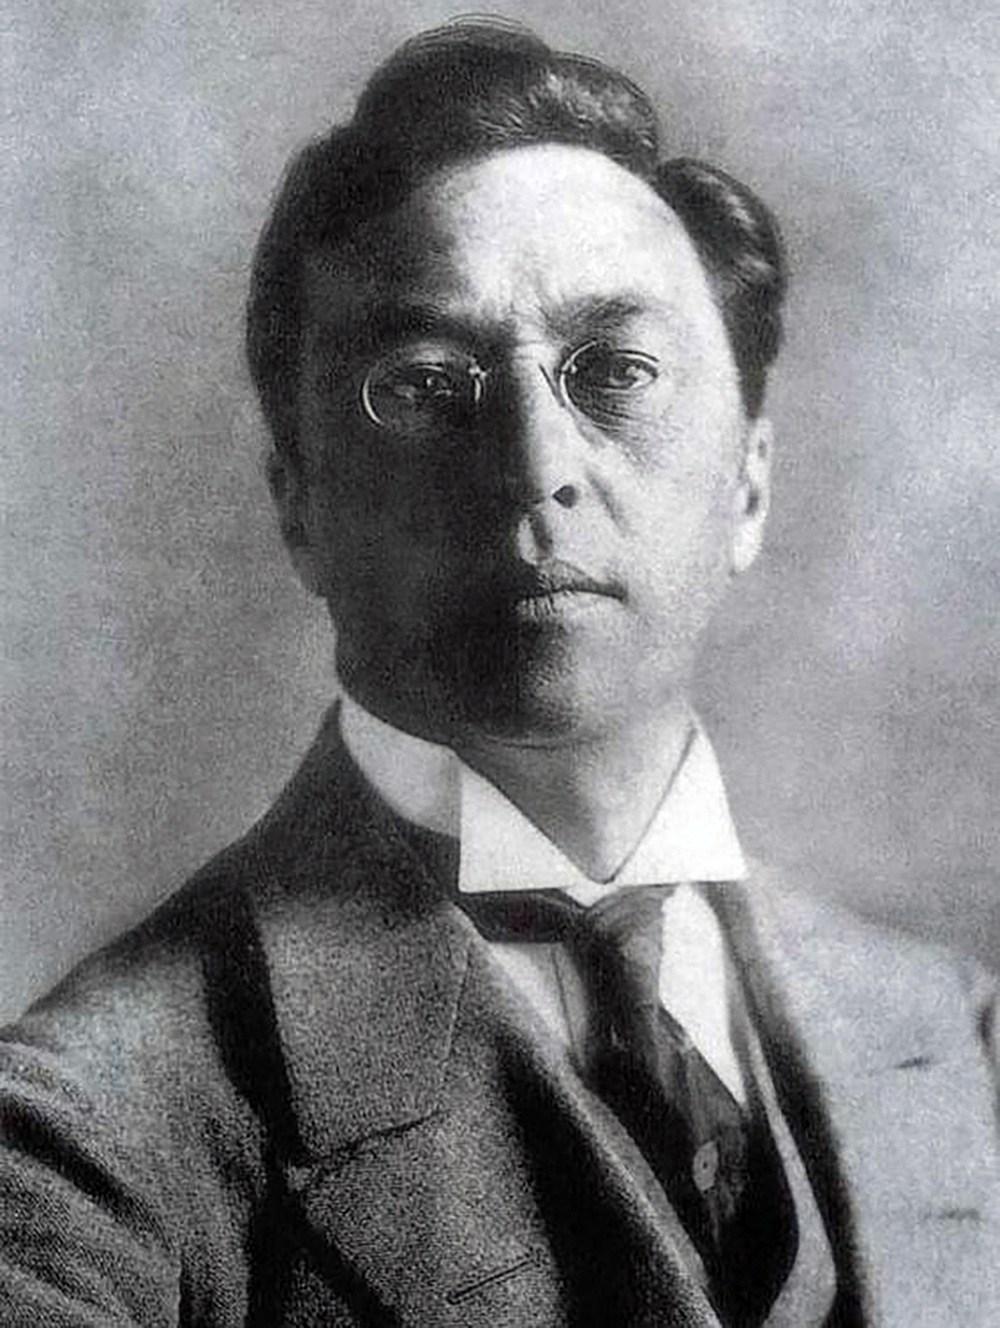 Portrait-Wassily-Kandinsky.jpg